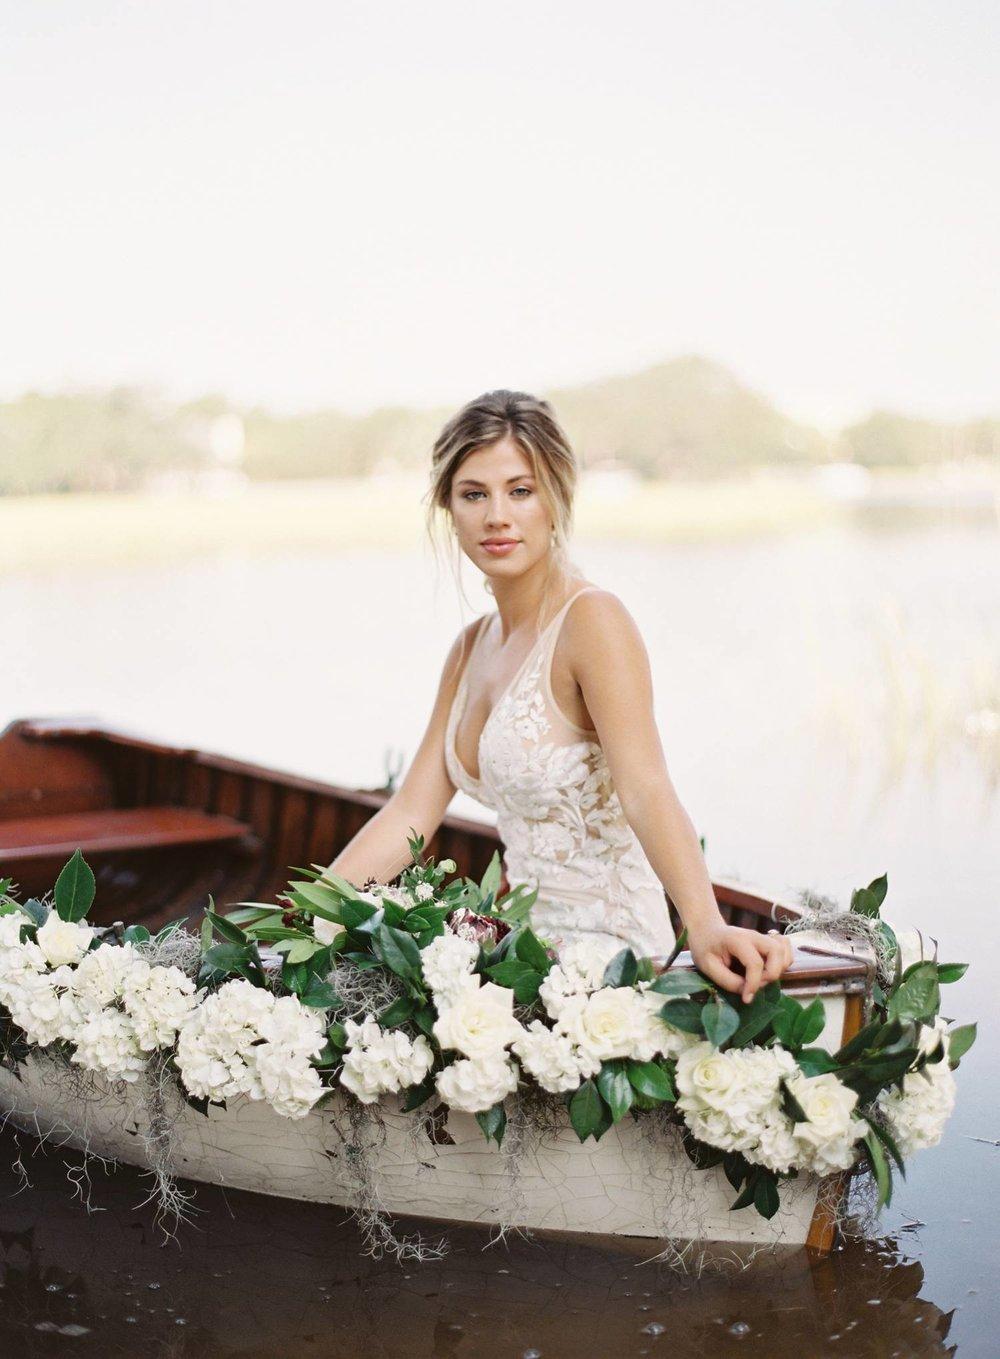 boonehallplantation_wedding_16.jpg